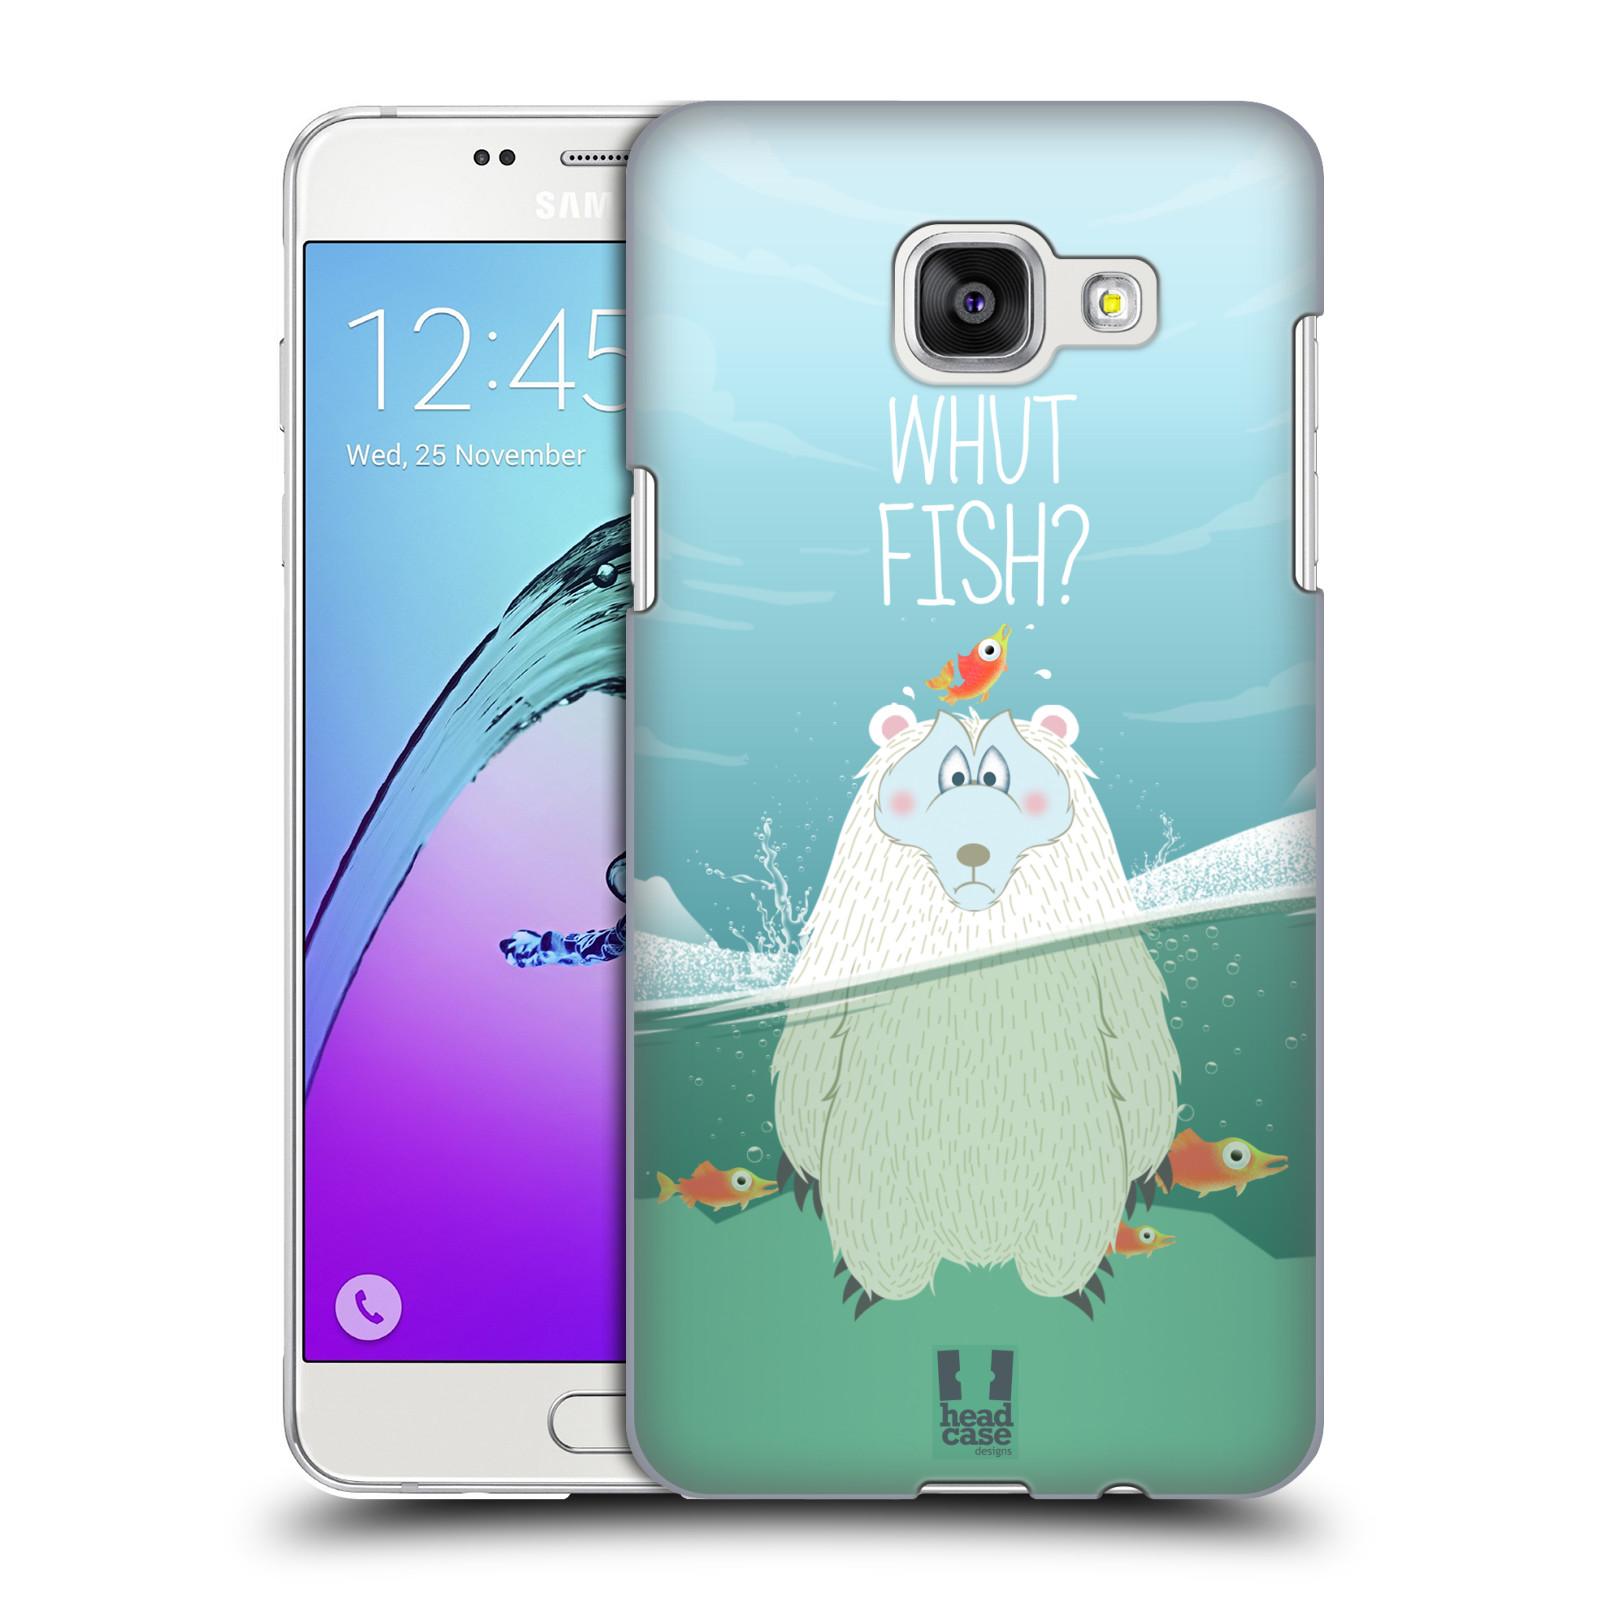 Plastové pouzdro na mobil Samsung Galaxy A5 (2016) HEAD CASE Medvěd Whut Fish?